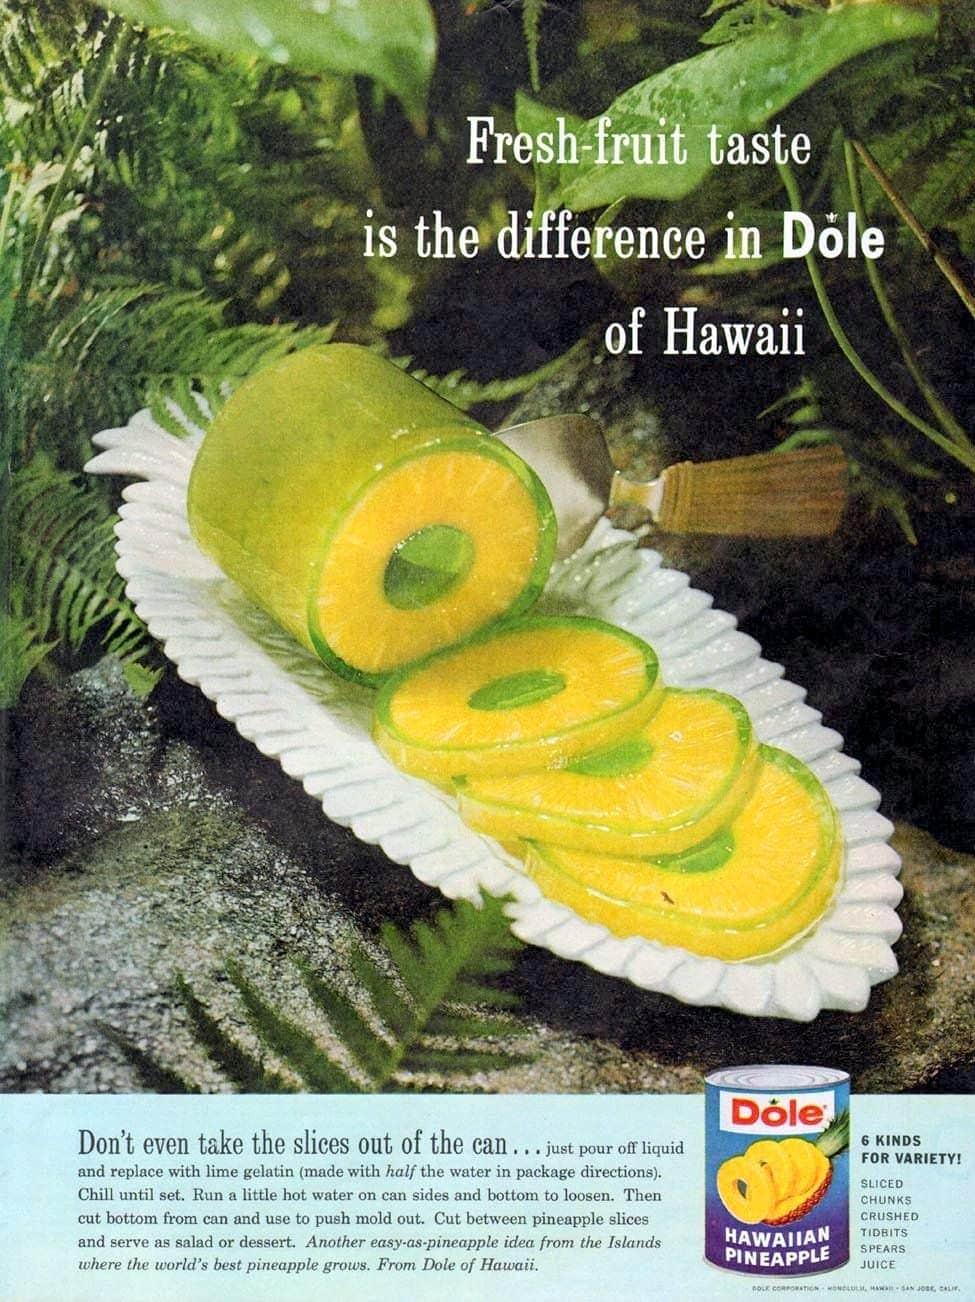 Pineapple jello can